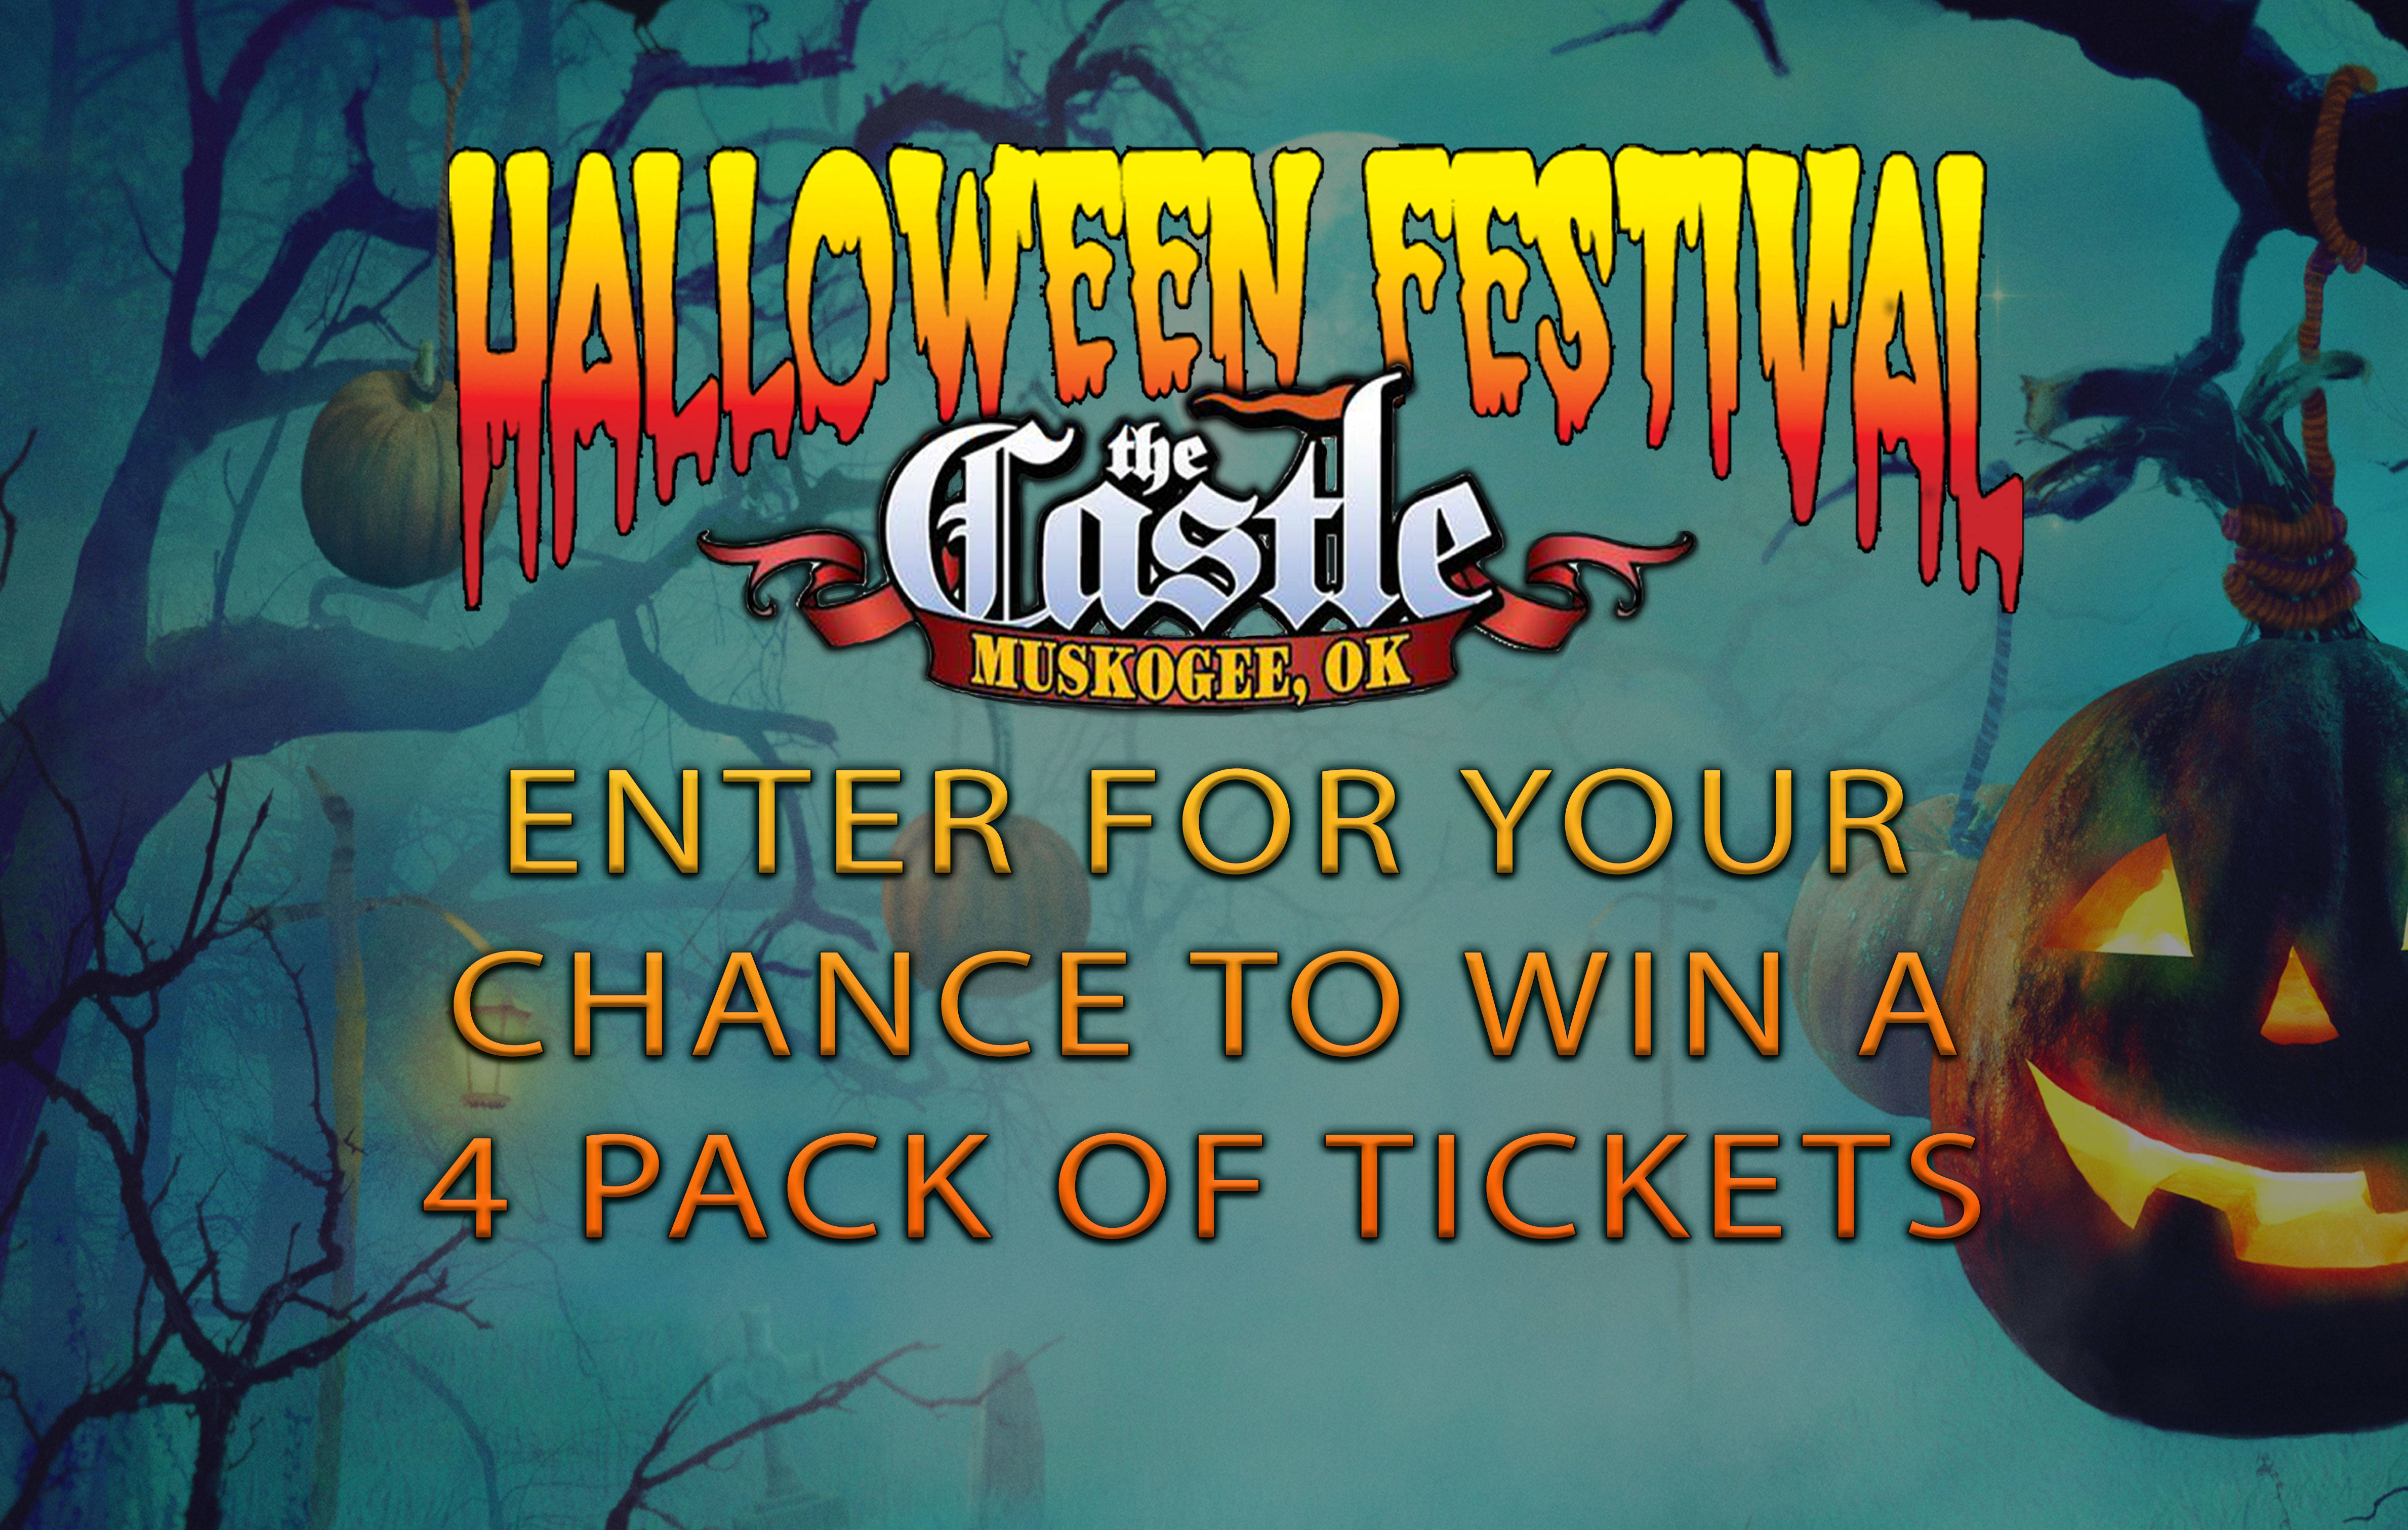 Castle of Muskogee Halloween Festival Ticket Giveaway